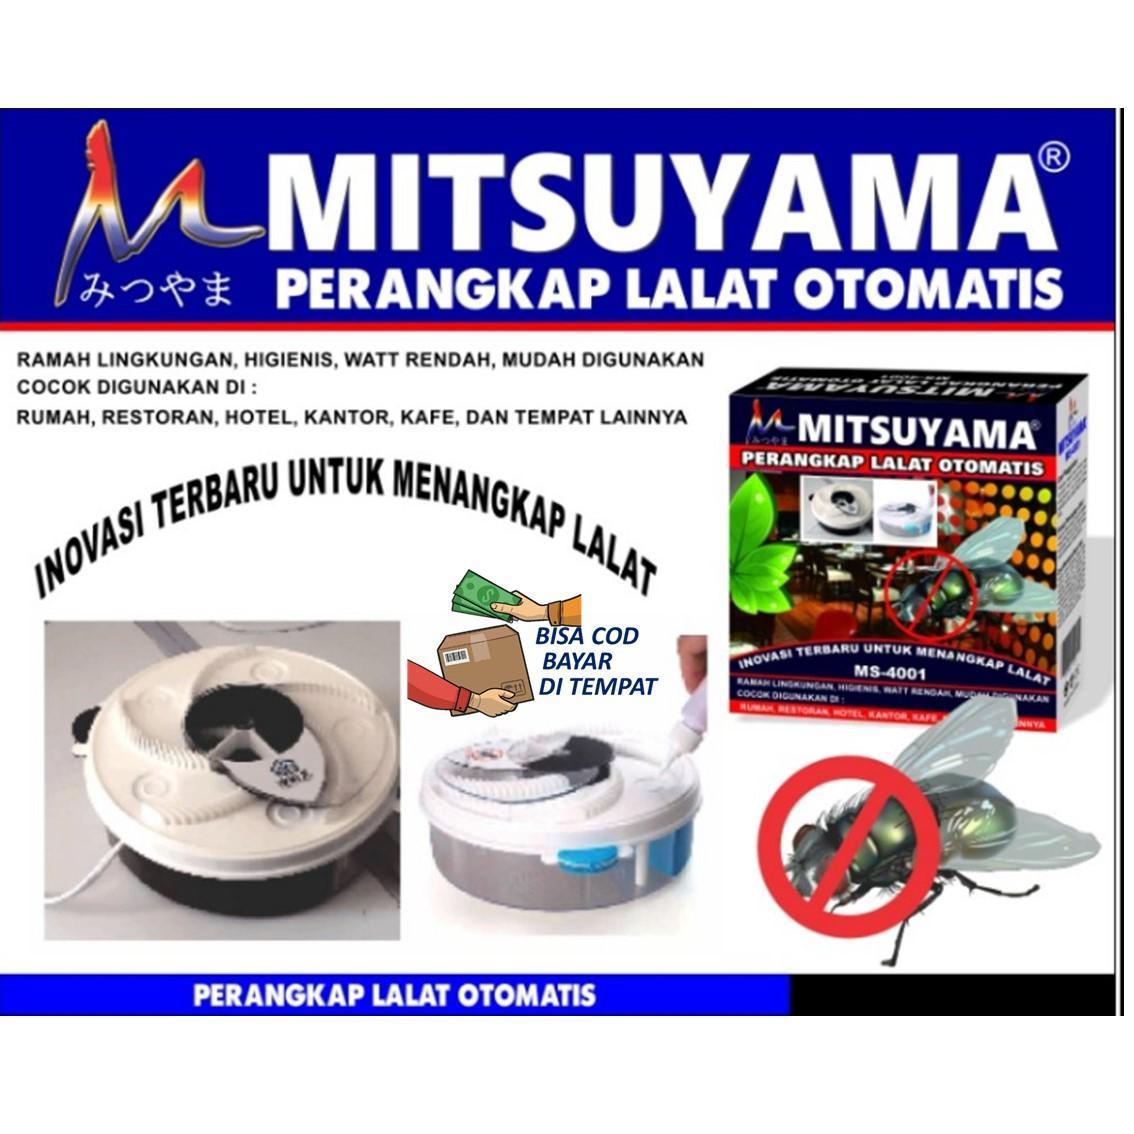 TERMURAH DI LAZADA Perangkap Lalat Otomatis / Jebakan Lalat Merk Mitsuyama MS-4001